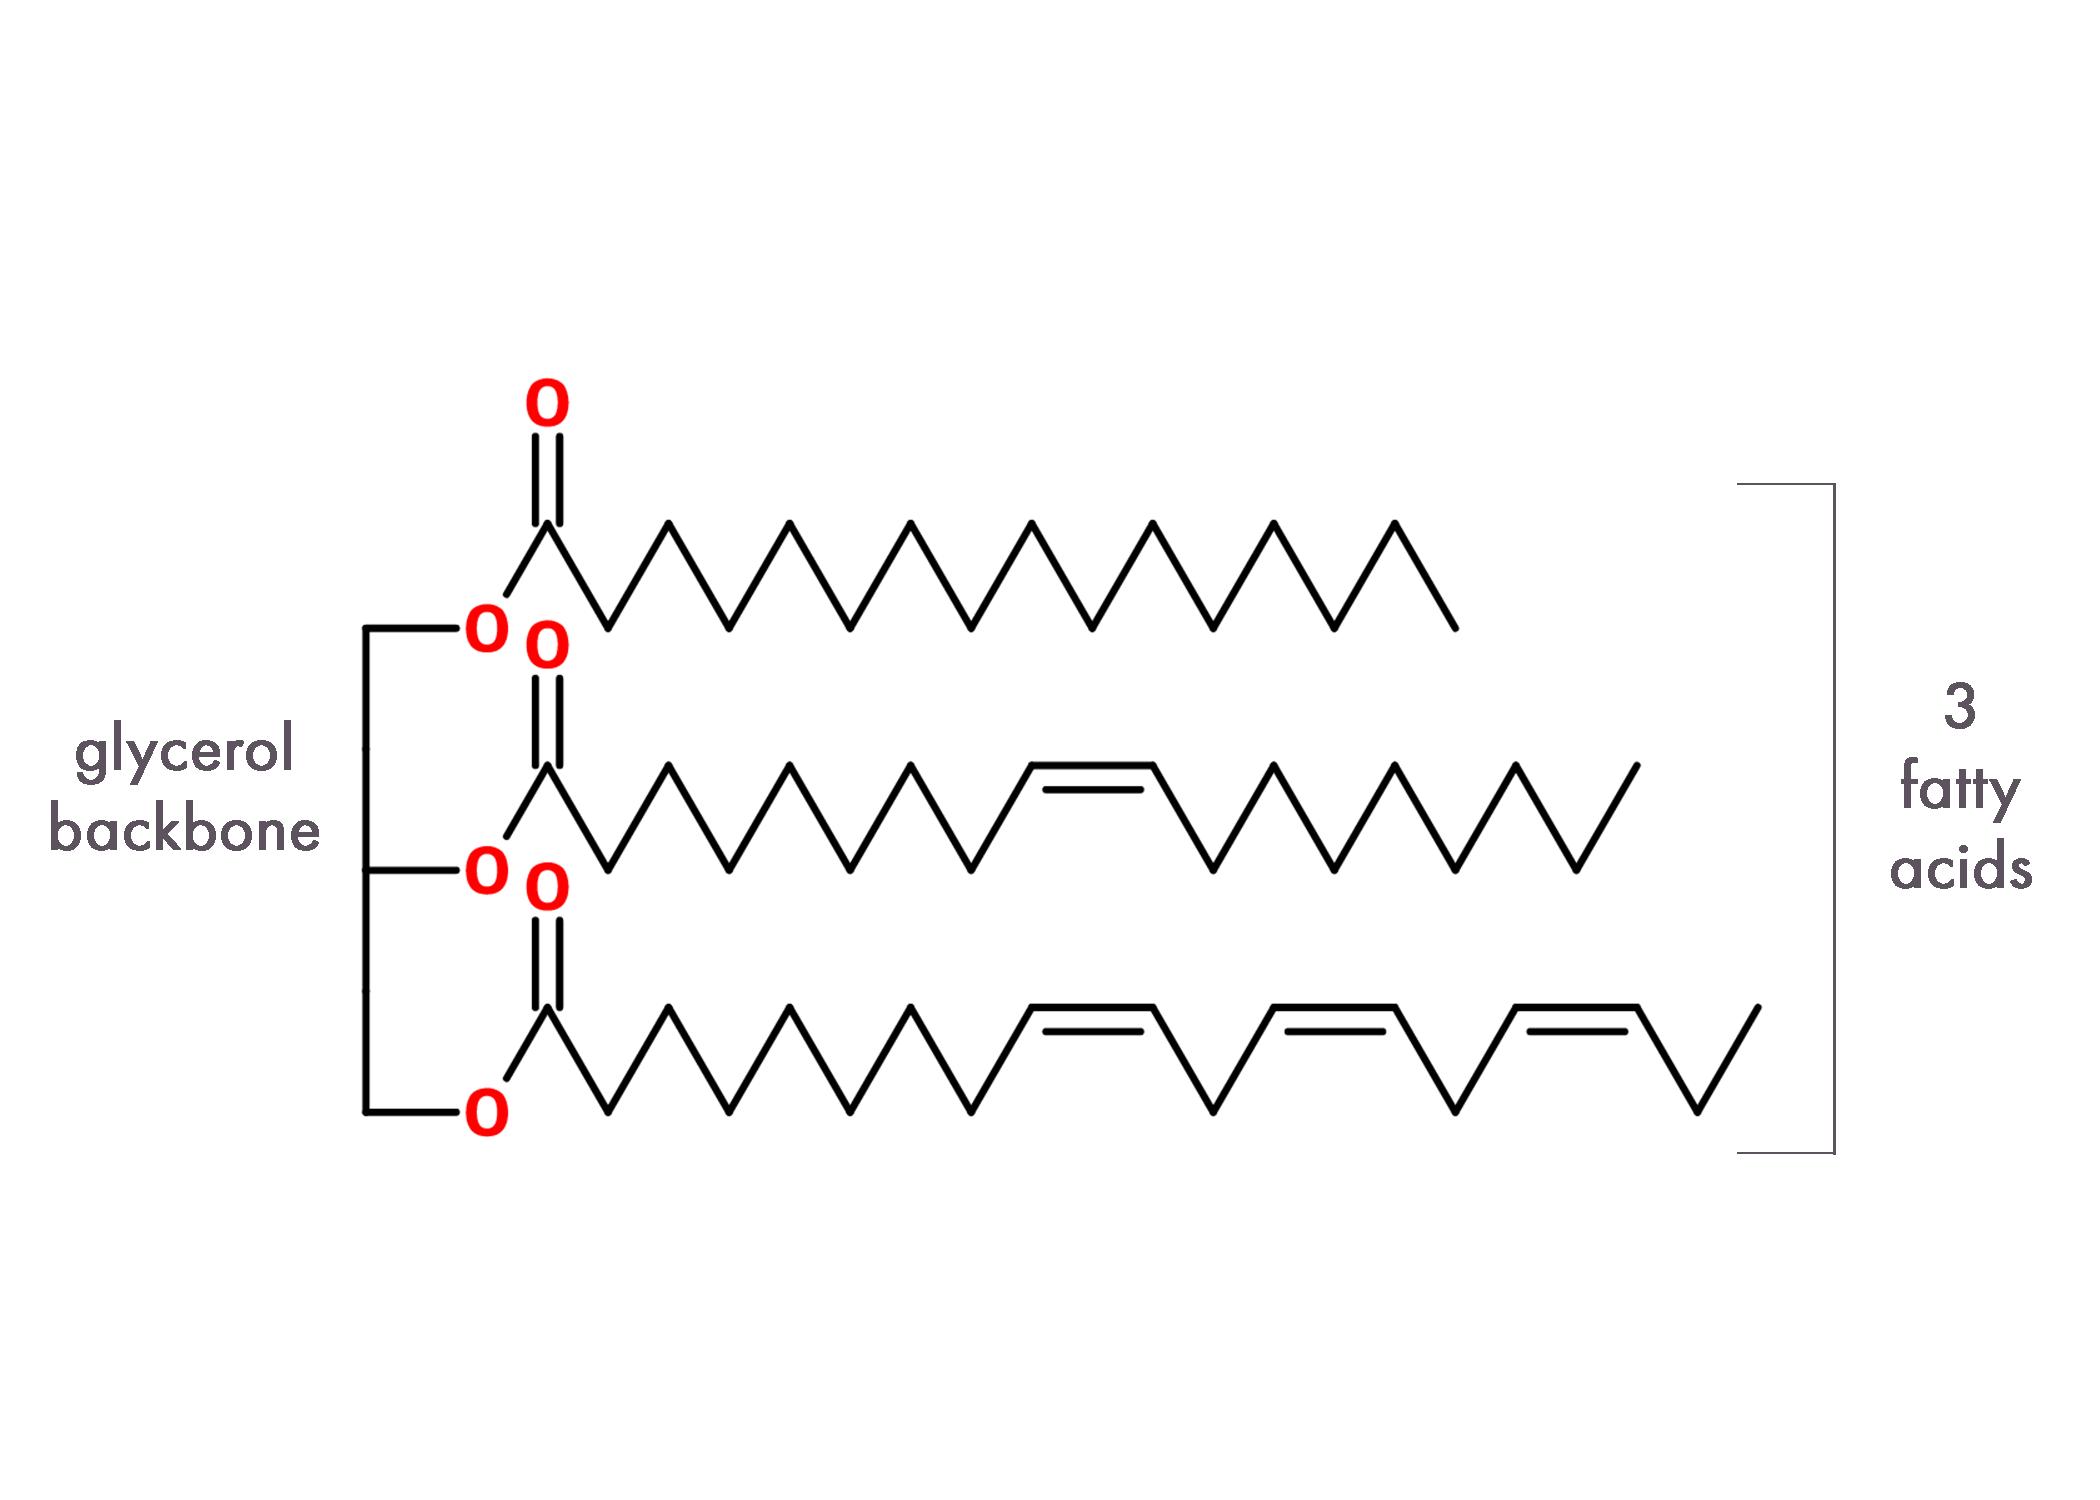 Figure 9. General structure of a triglcyeride